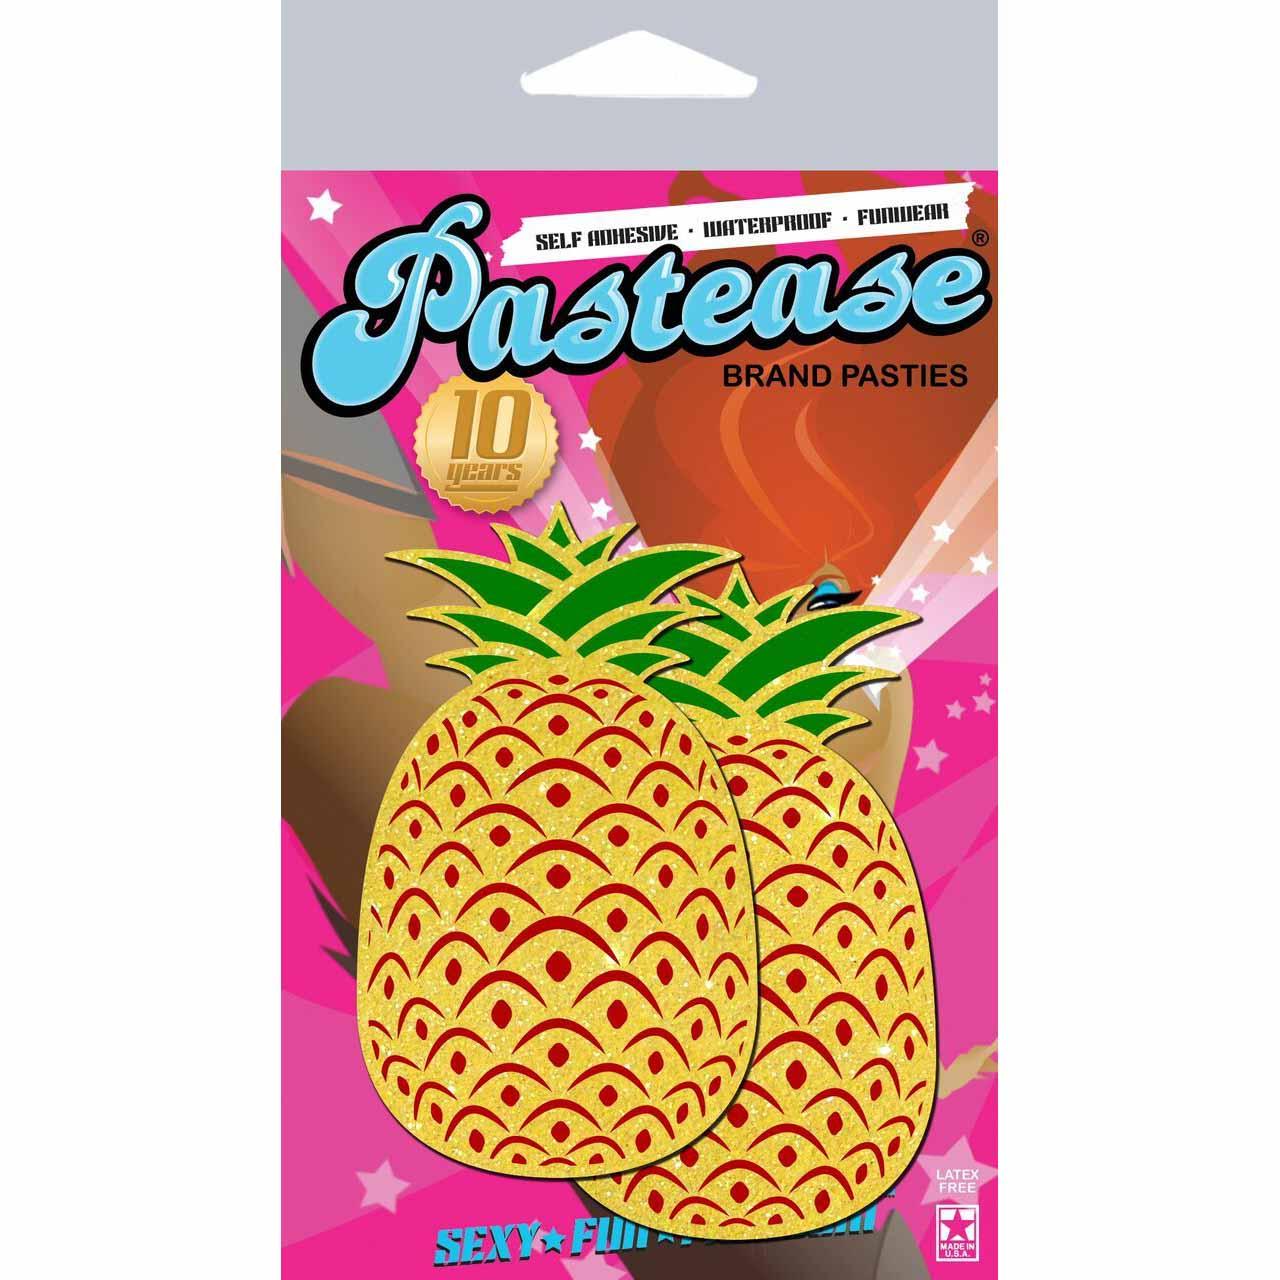 Pineapple Pasties